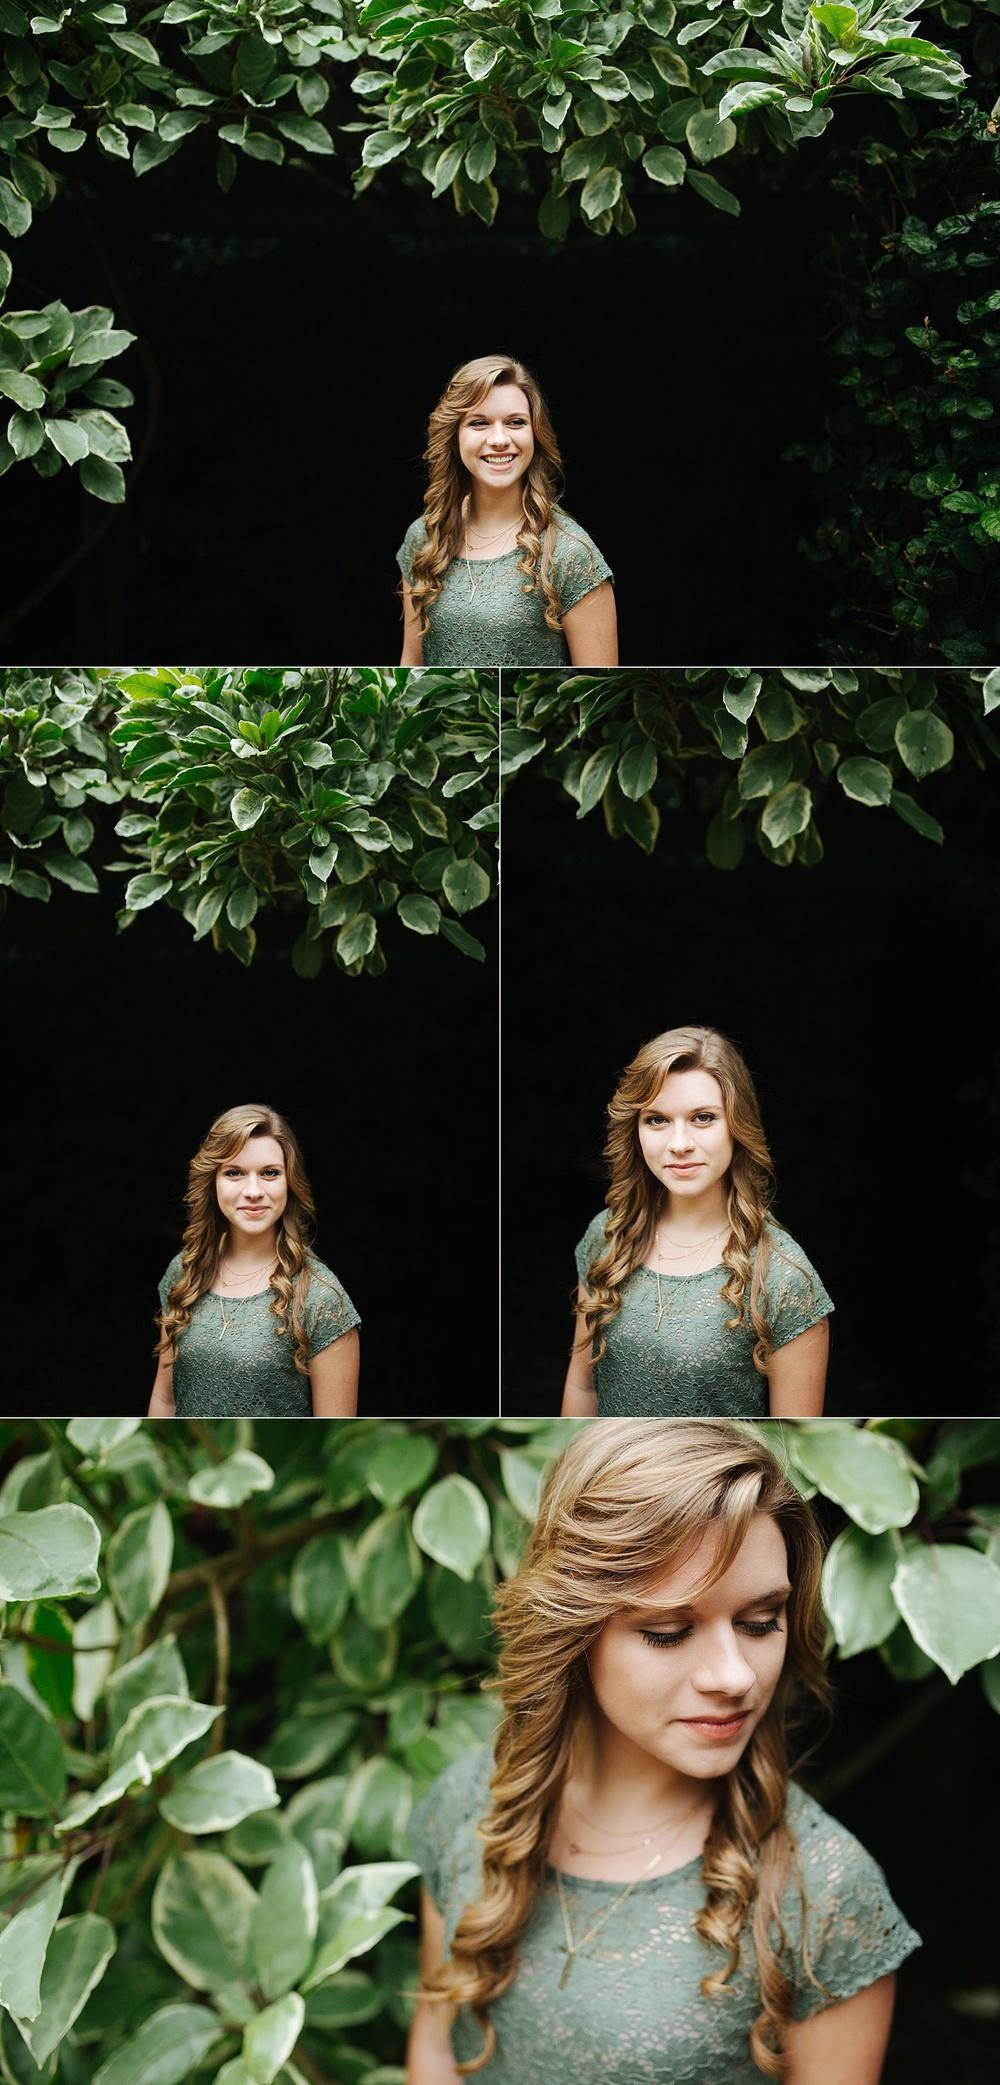 stpete senior portraits sunken gardens leah-1